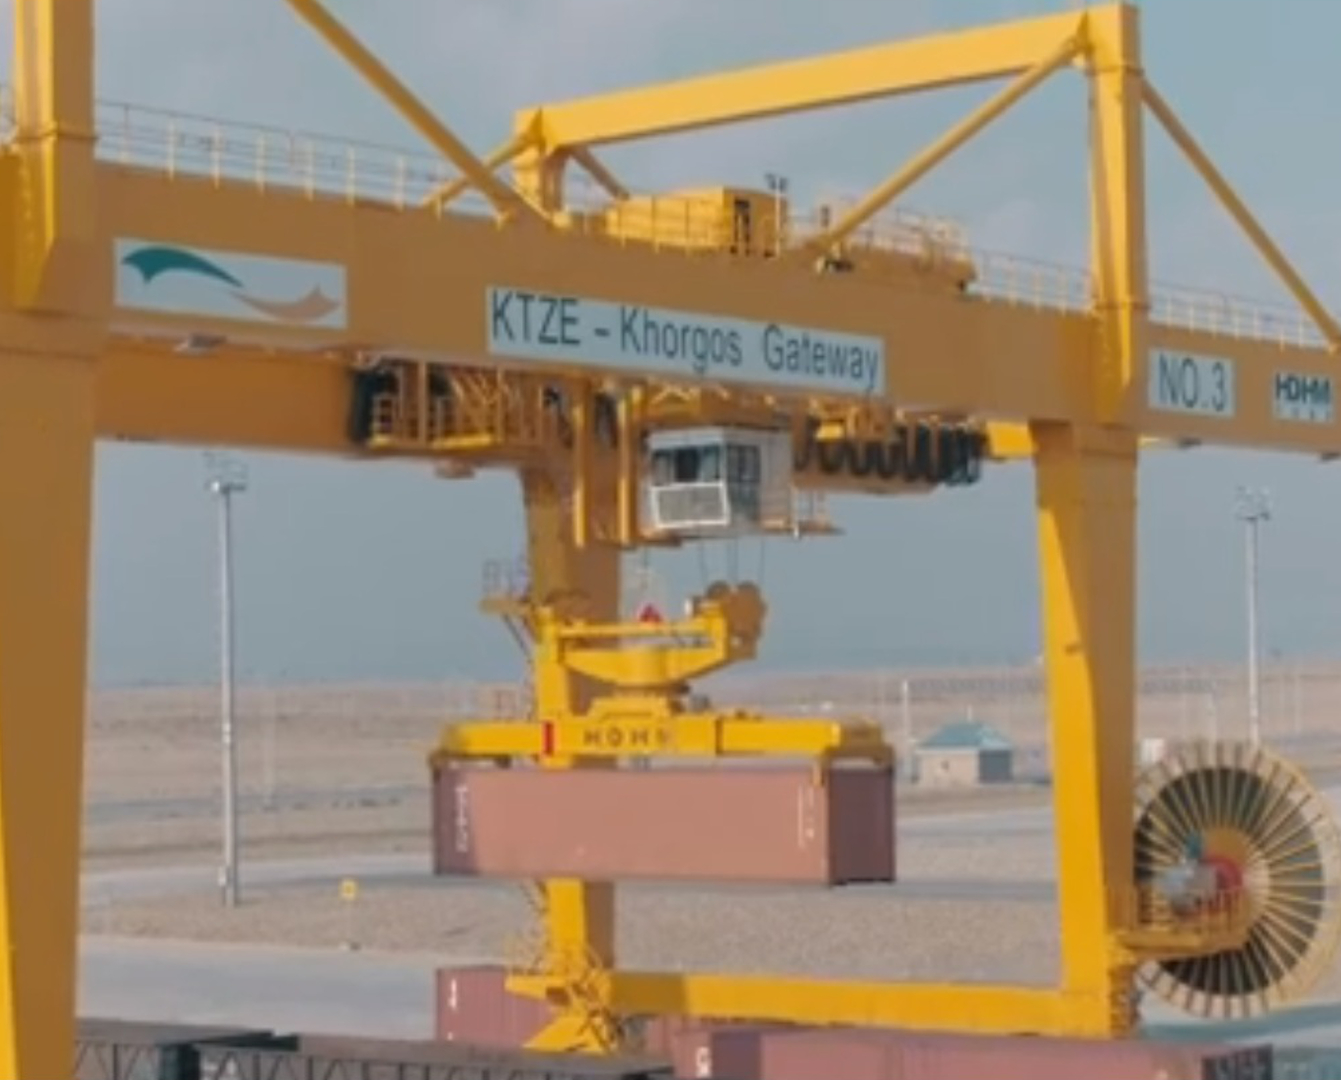 BBC: Khorgos Gateway can revive Silk Road